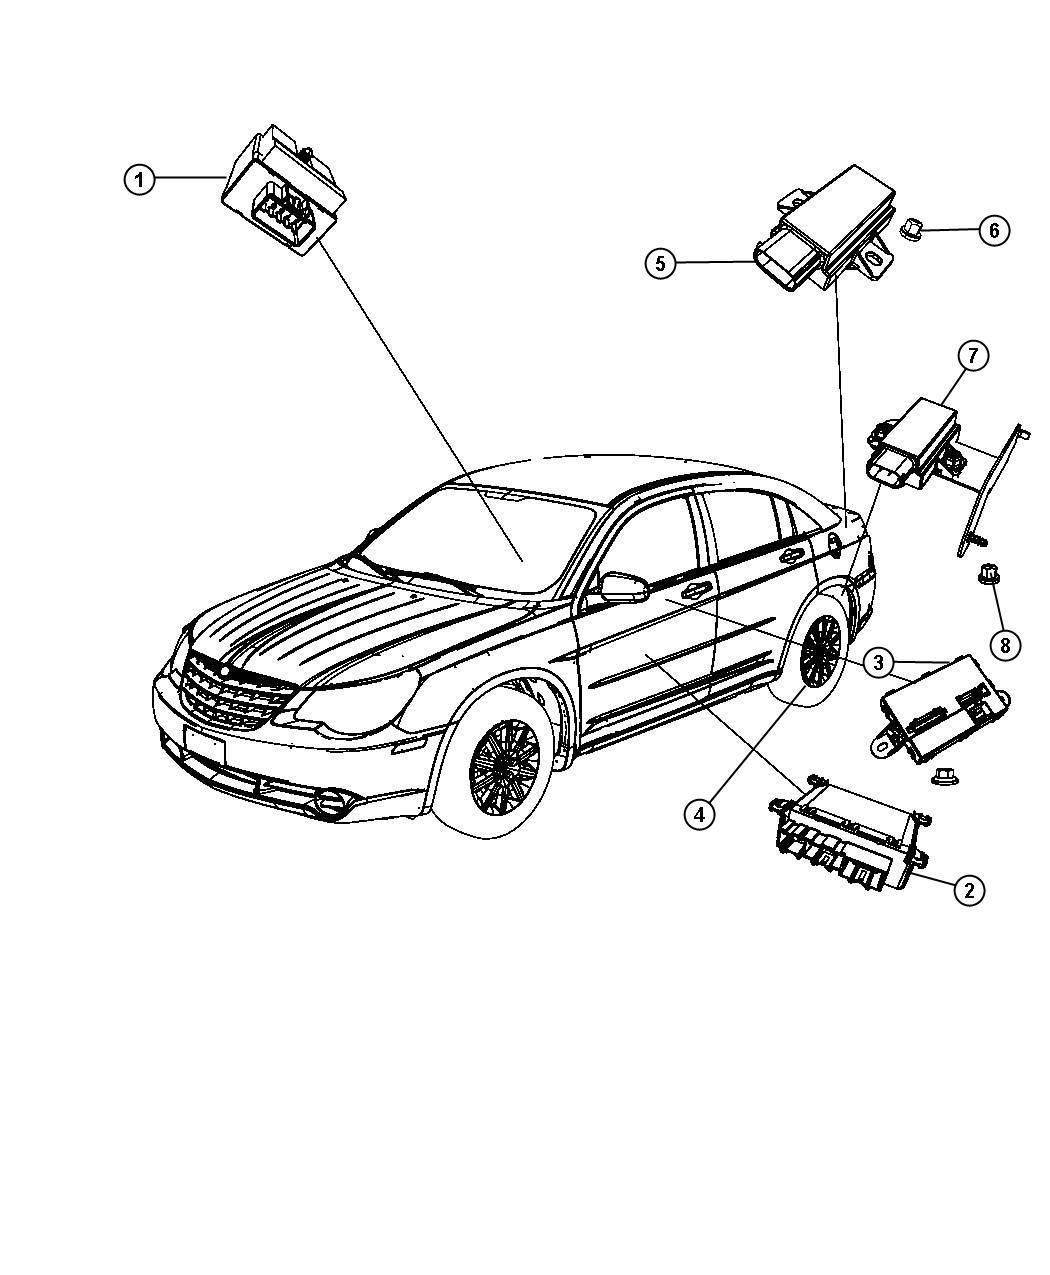 Chrysler Sebring Module Convertible Top Control